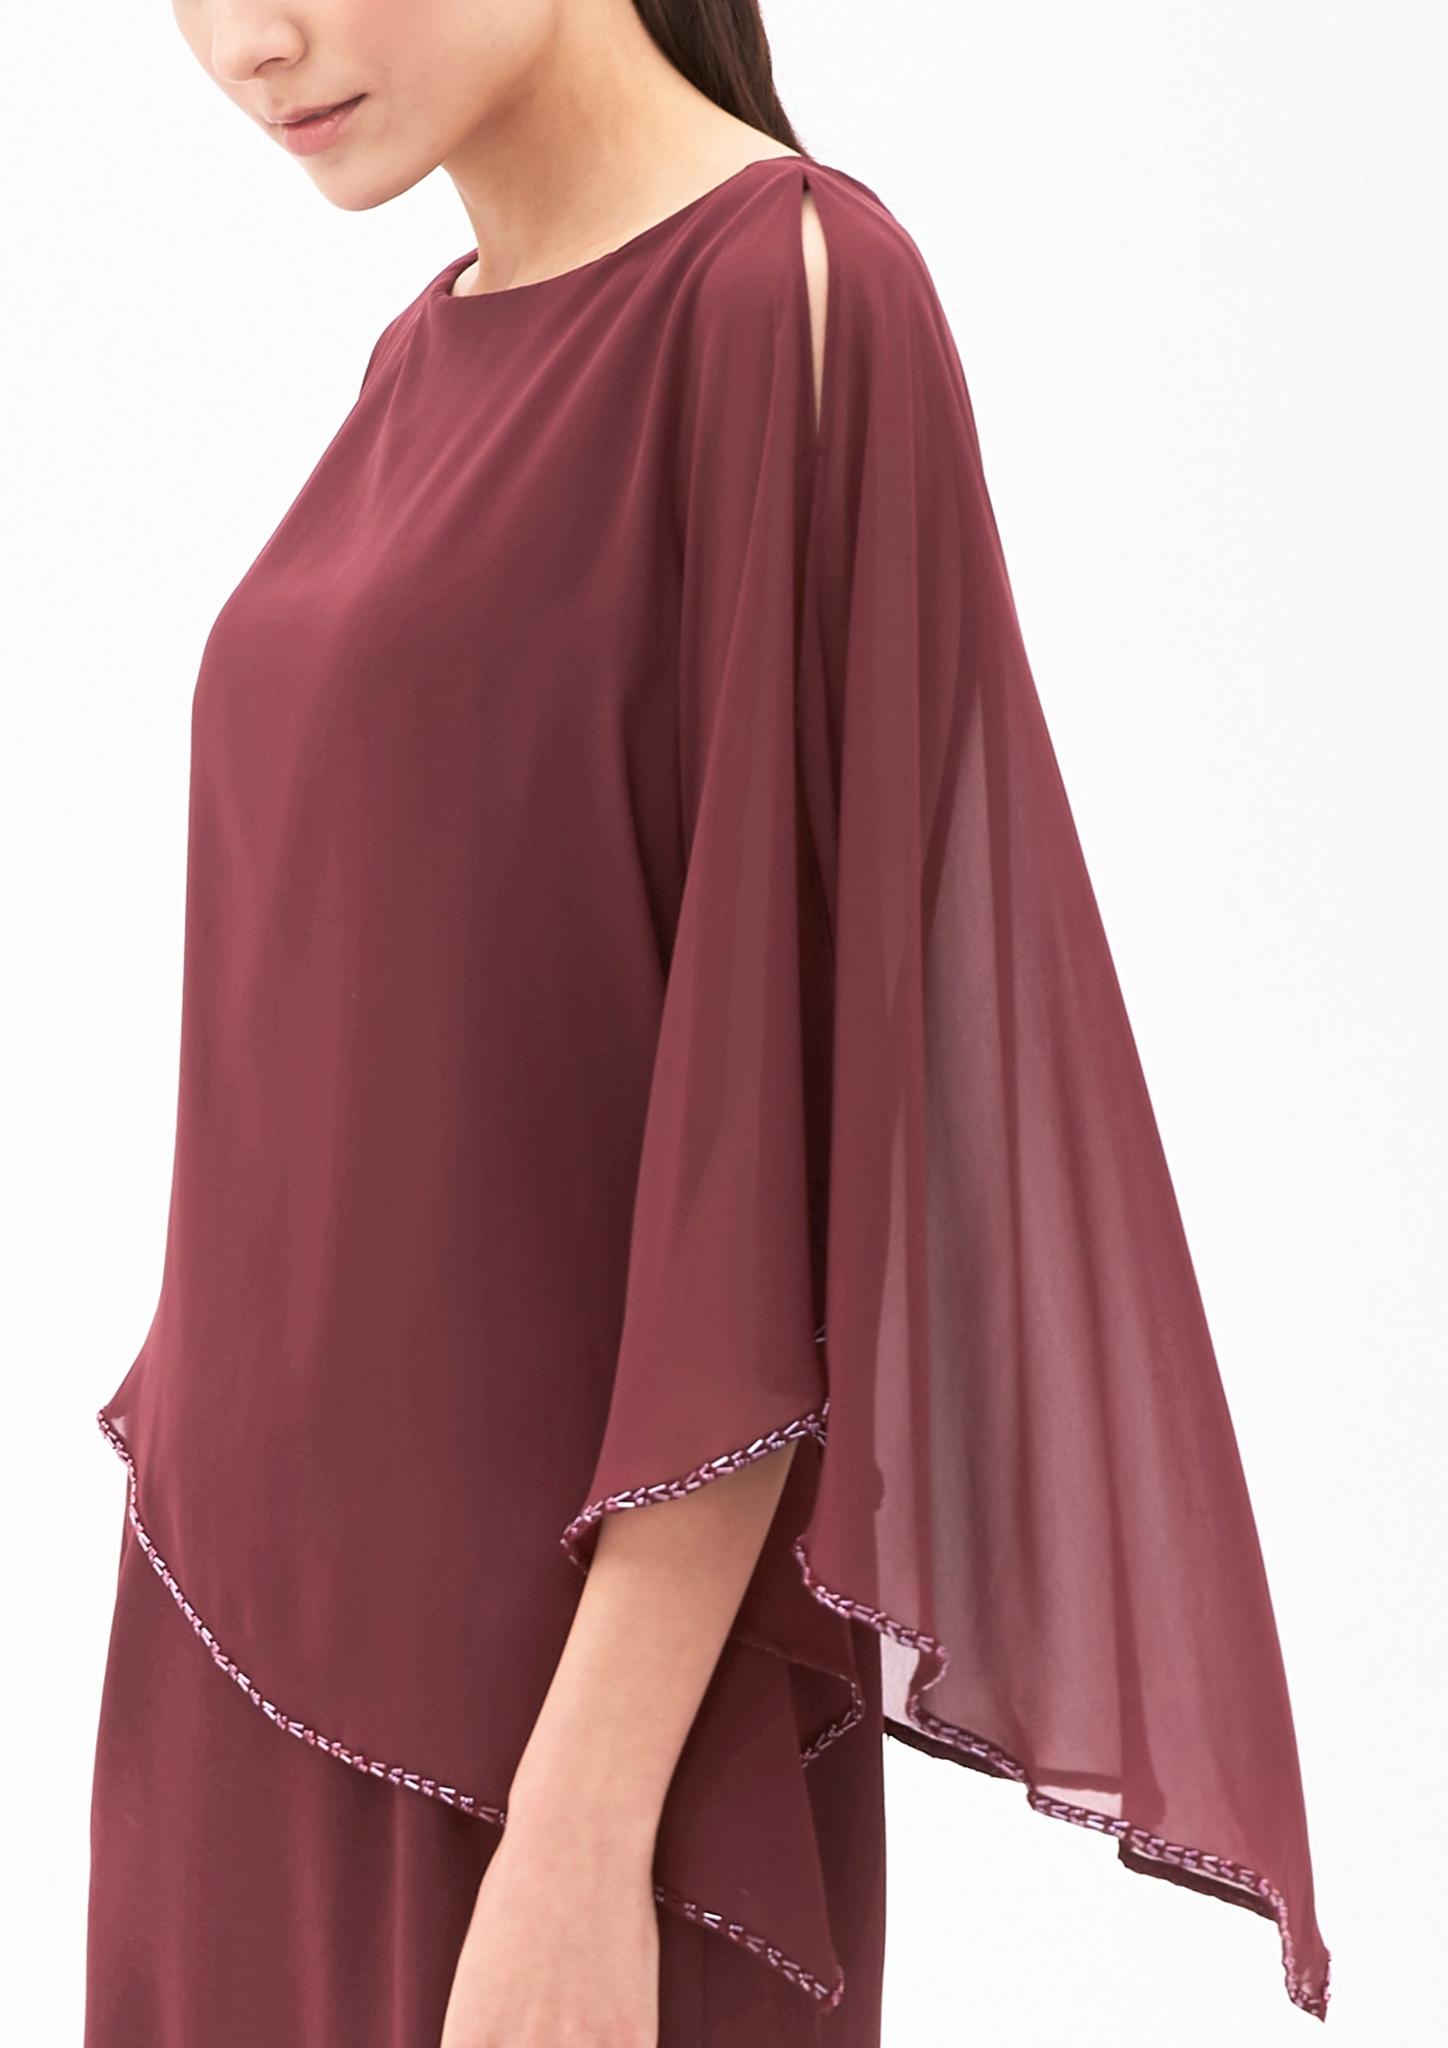 S oliver red dress costume